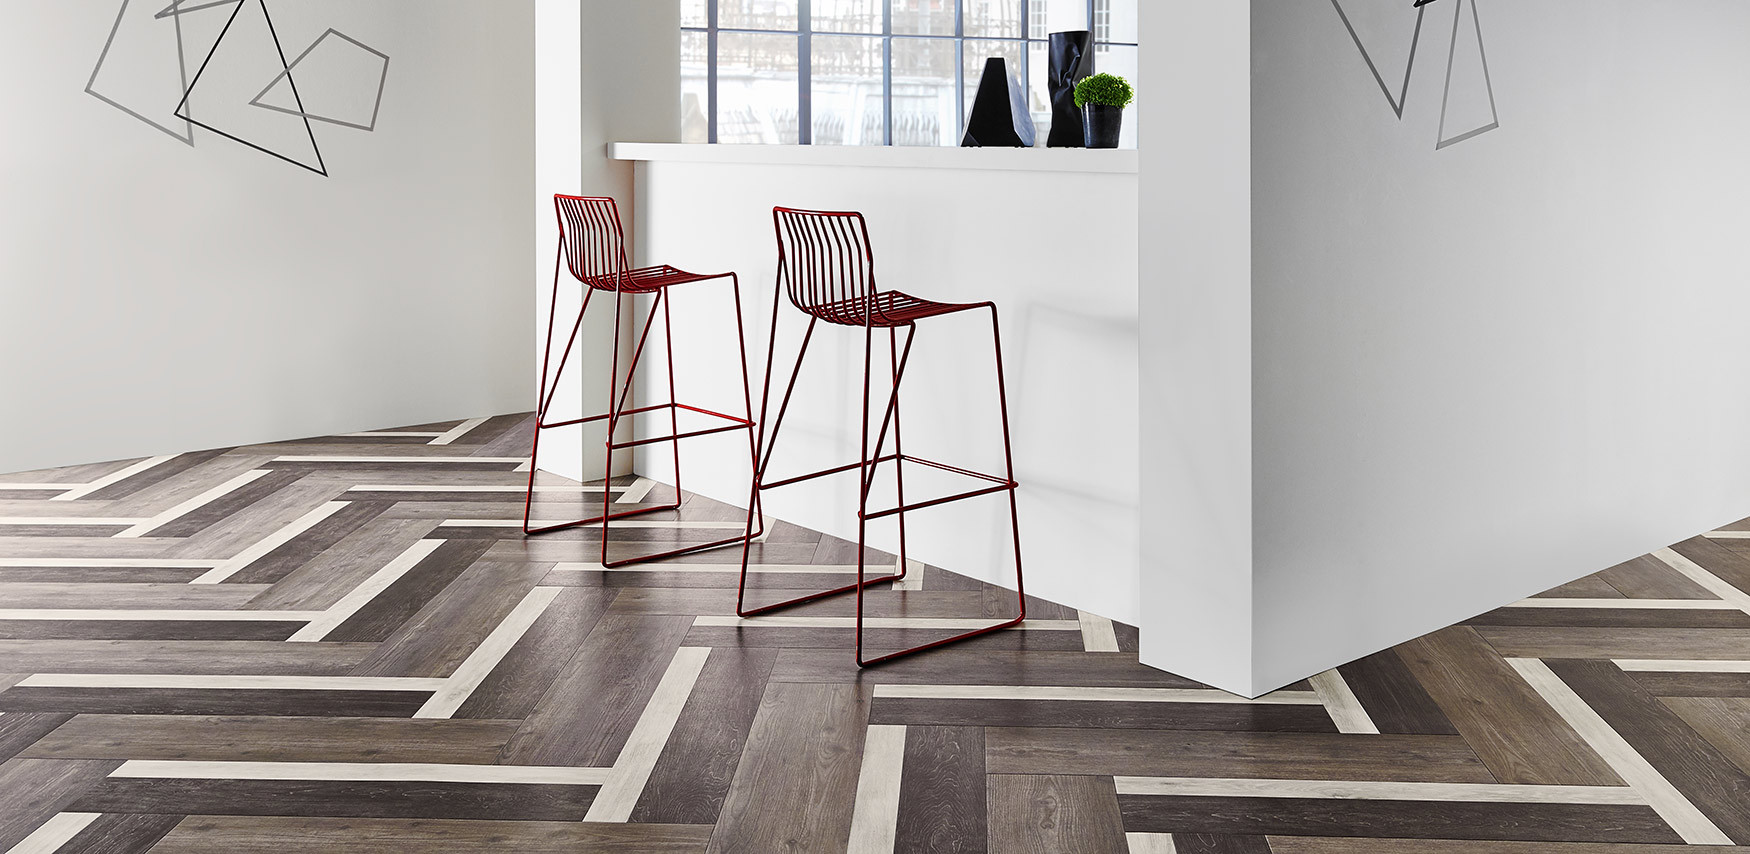 hardwood floor refinishing medford or of mannington flooring resilient laminate hardwood luxury vinyl in amtico commercial